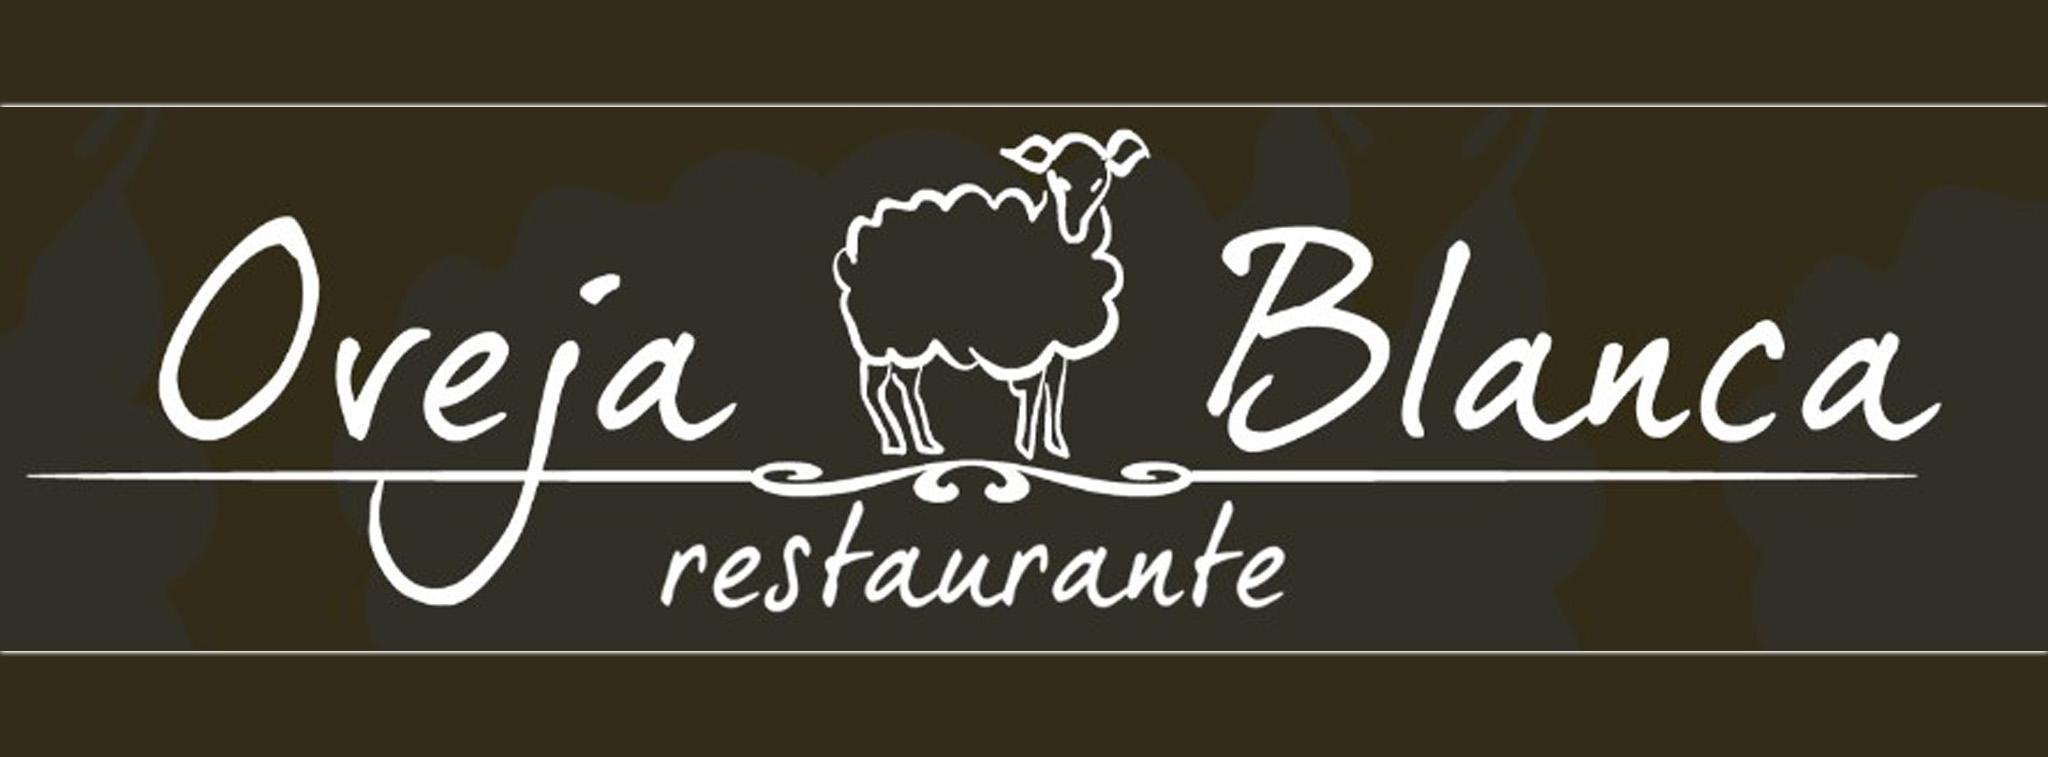 ojeva-blanco-restaurant